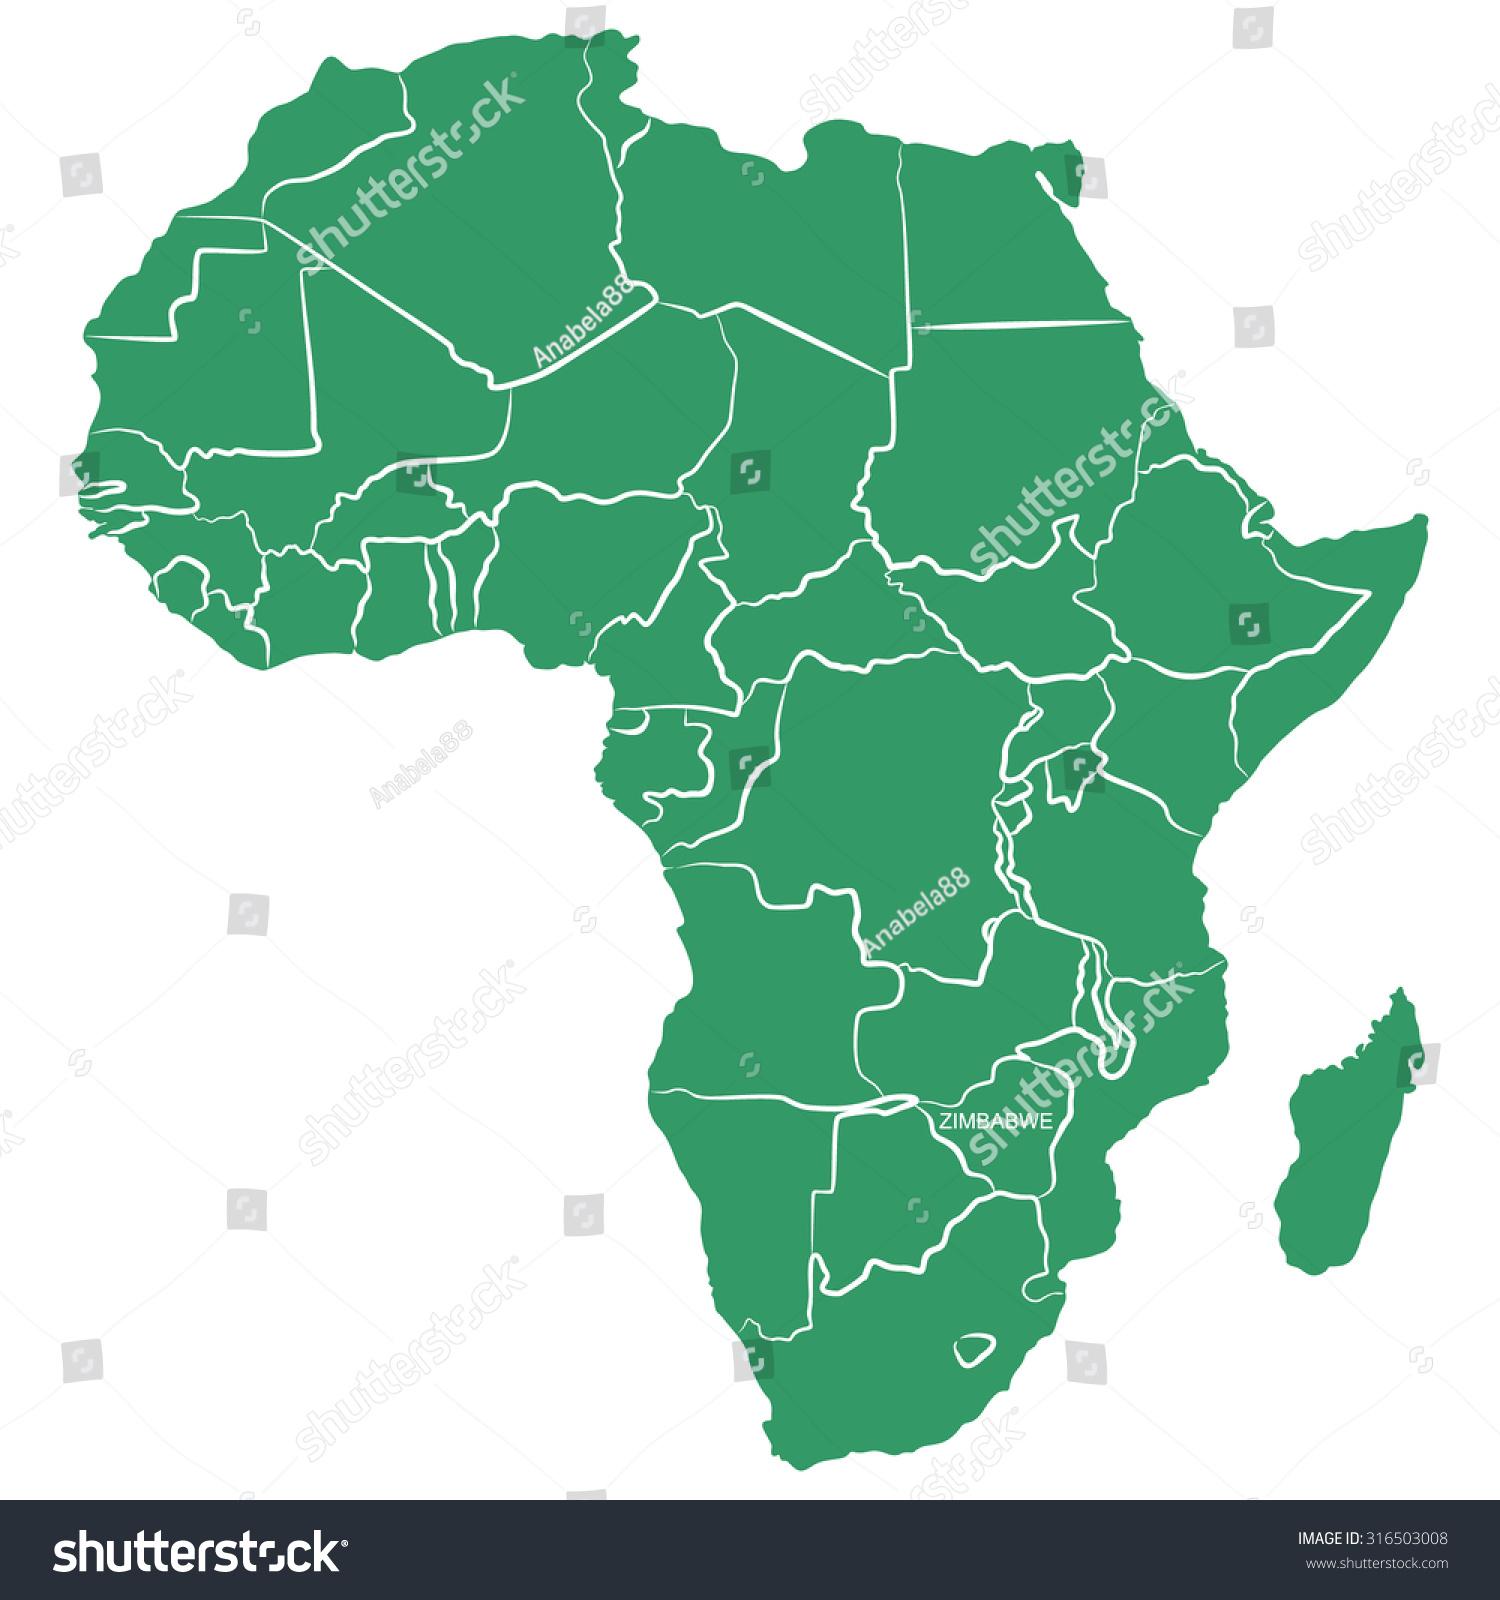 Map Of Africa Zimbabwe.Map Africa Zimbabwe Stock Vector Royalty Free 316503008 Shutterstock